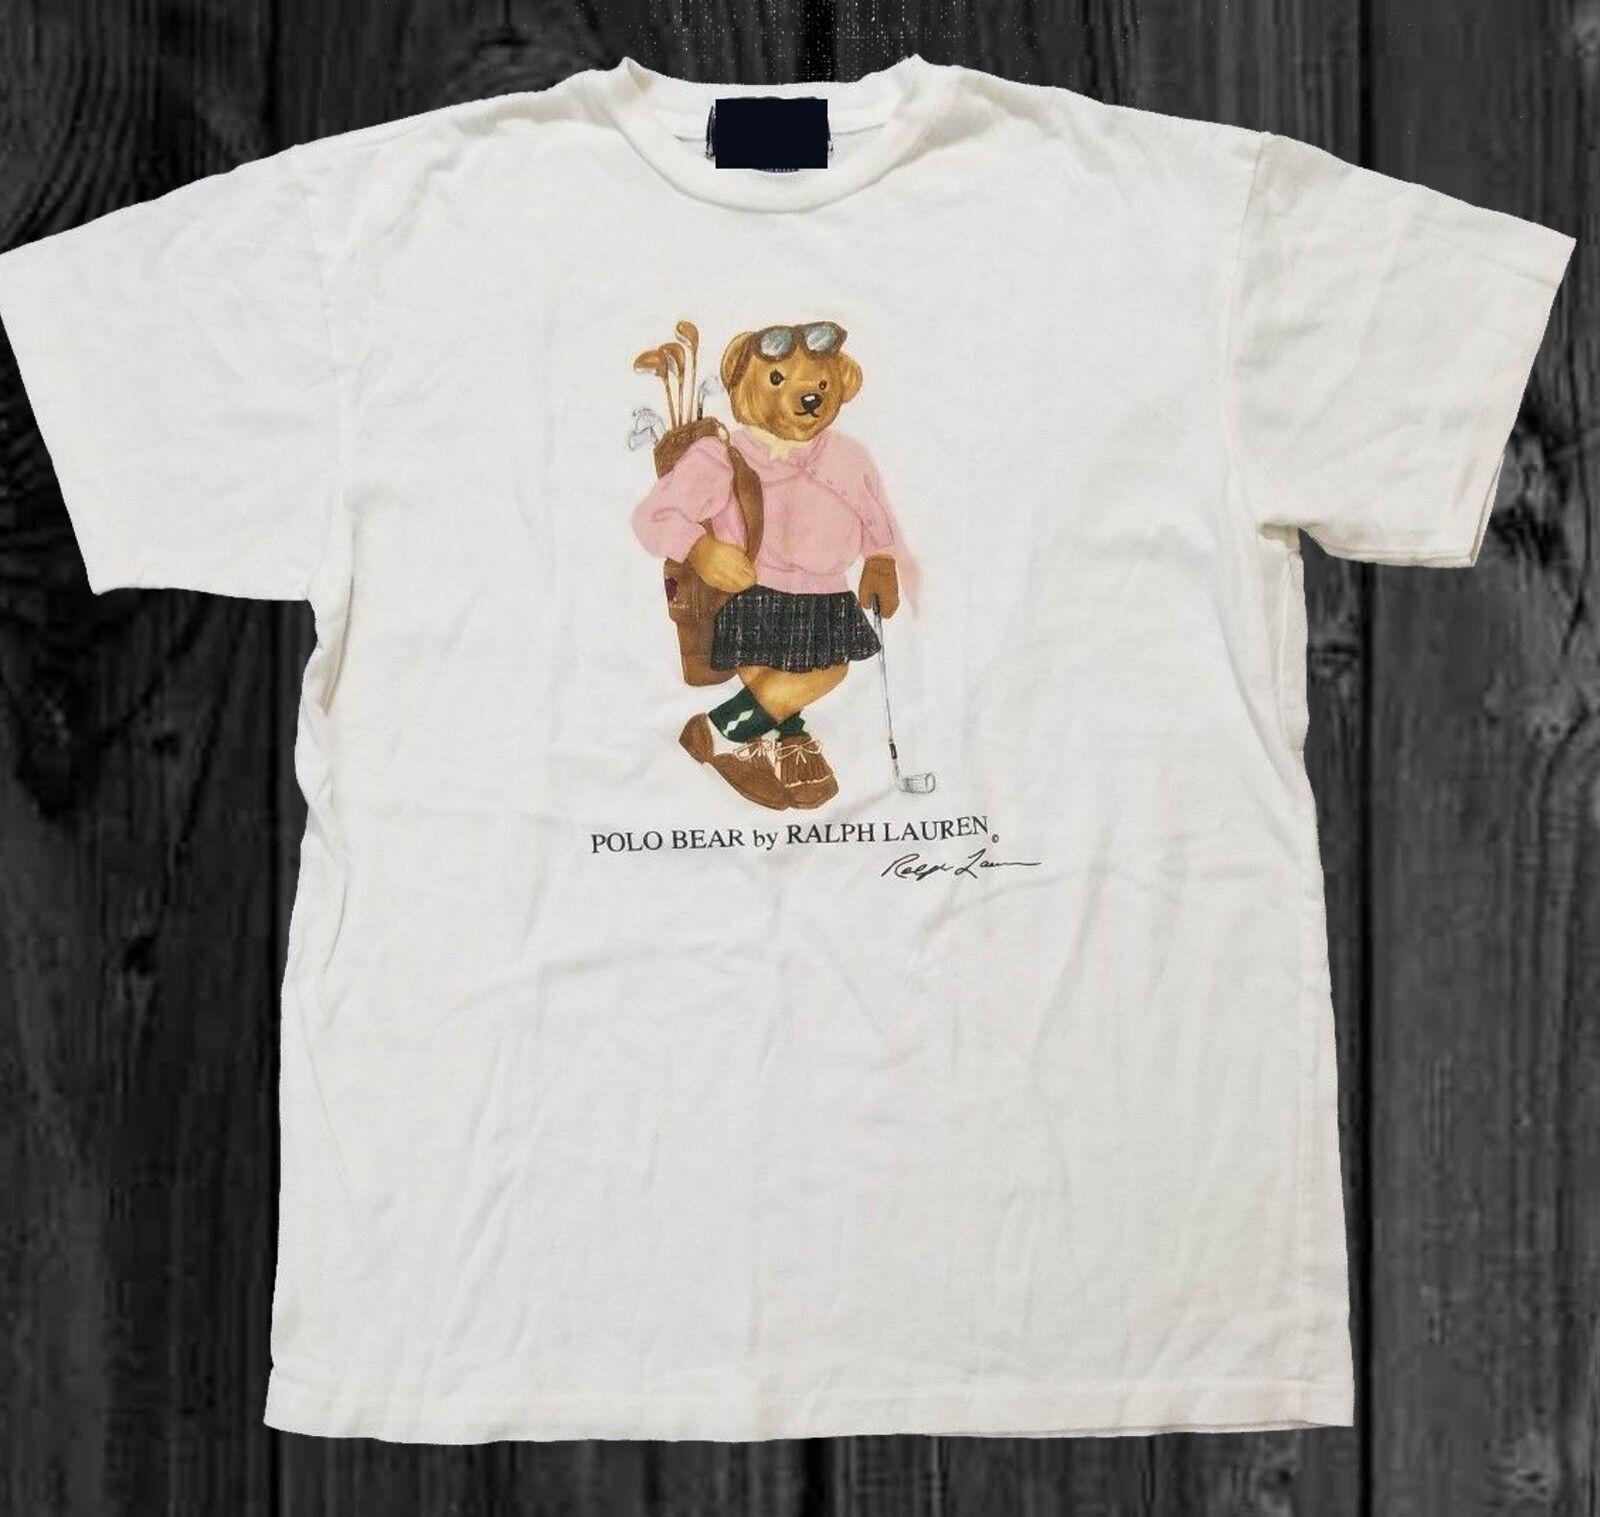 8d27850b9 Vintage Polo Bear Womens Golf T shirt Size Reprint Rare short sleeve men  Tee T shirt o-neck knitted comfortable fabric